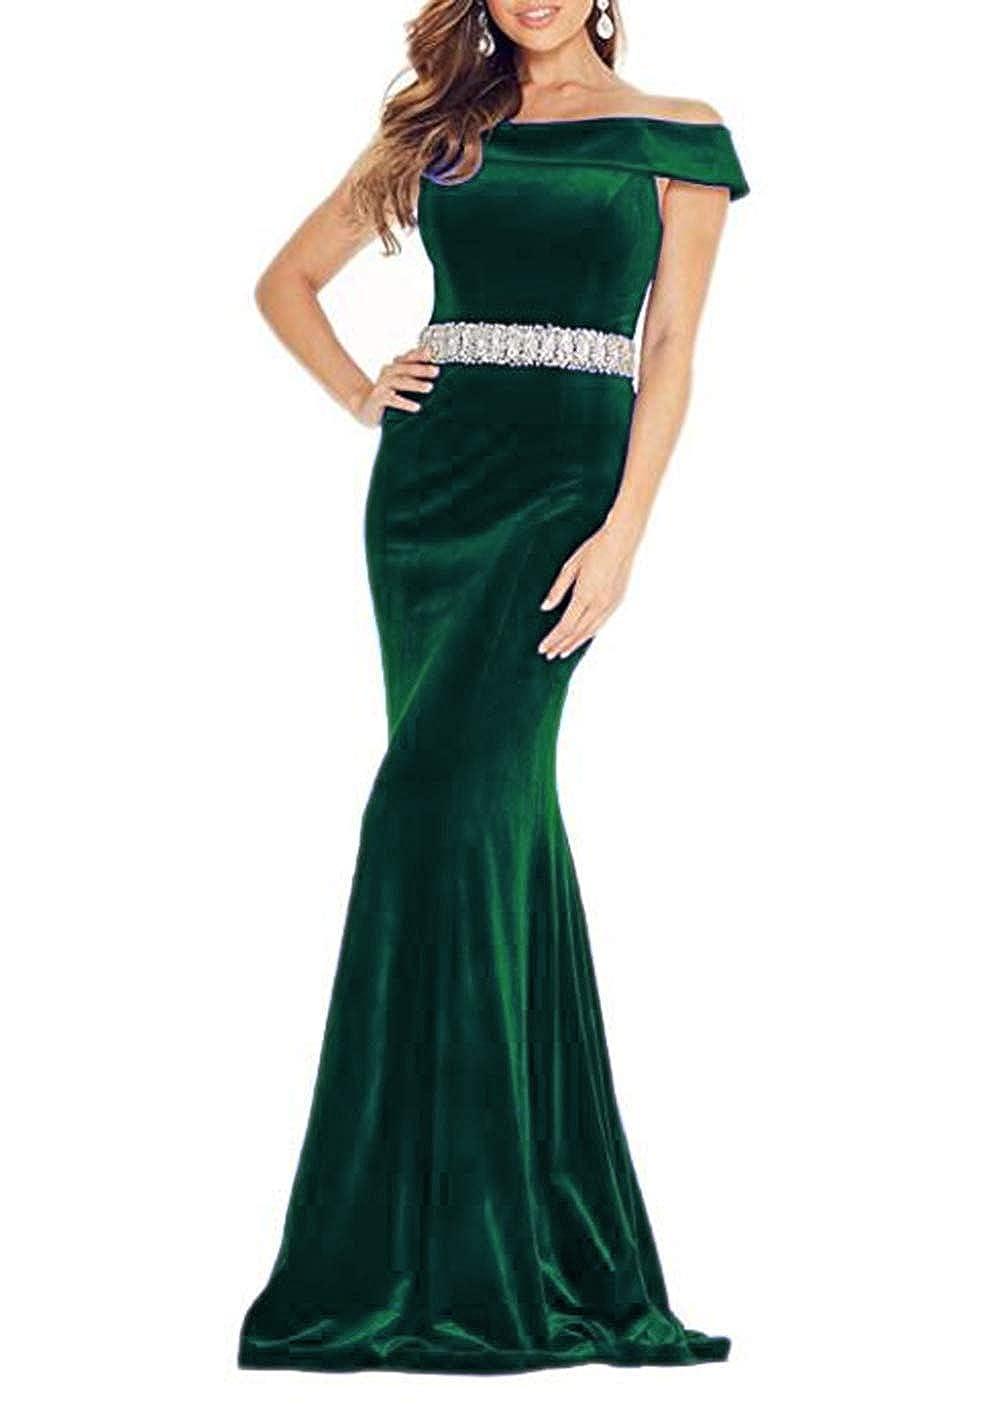 Dark Green alilith.Z Off The Shoulder Mermiad Velvet Prom Dresses Long Formal Evening Dresses for Women with Beaded Belt